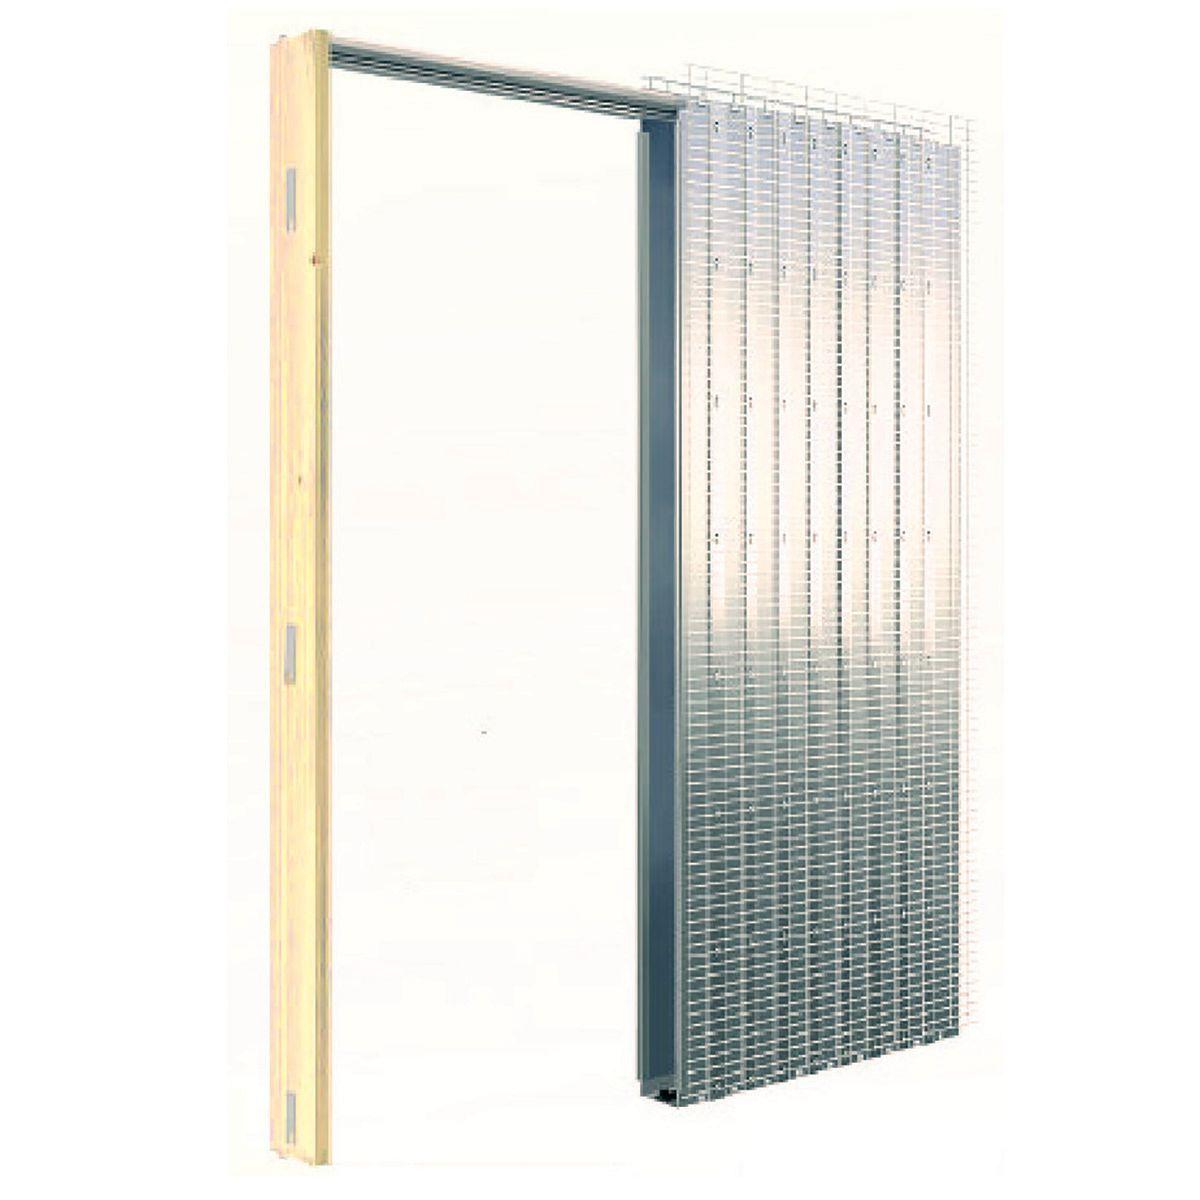 Porte da interni leroy merlin bagnoporta doccia - Porta carta igienica leroy merlin ...